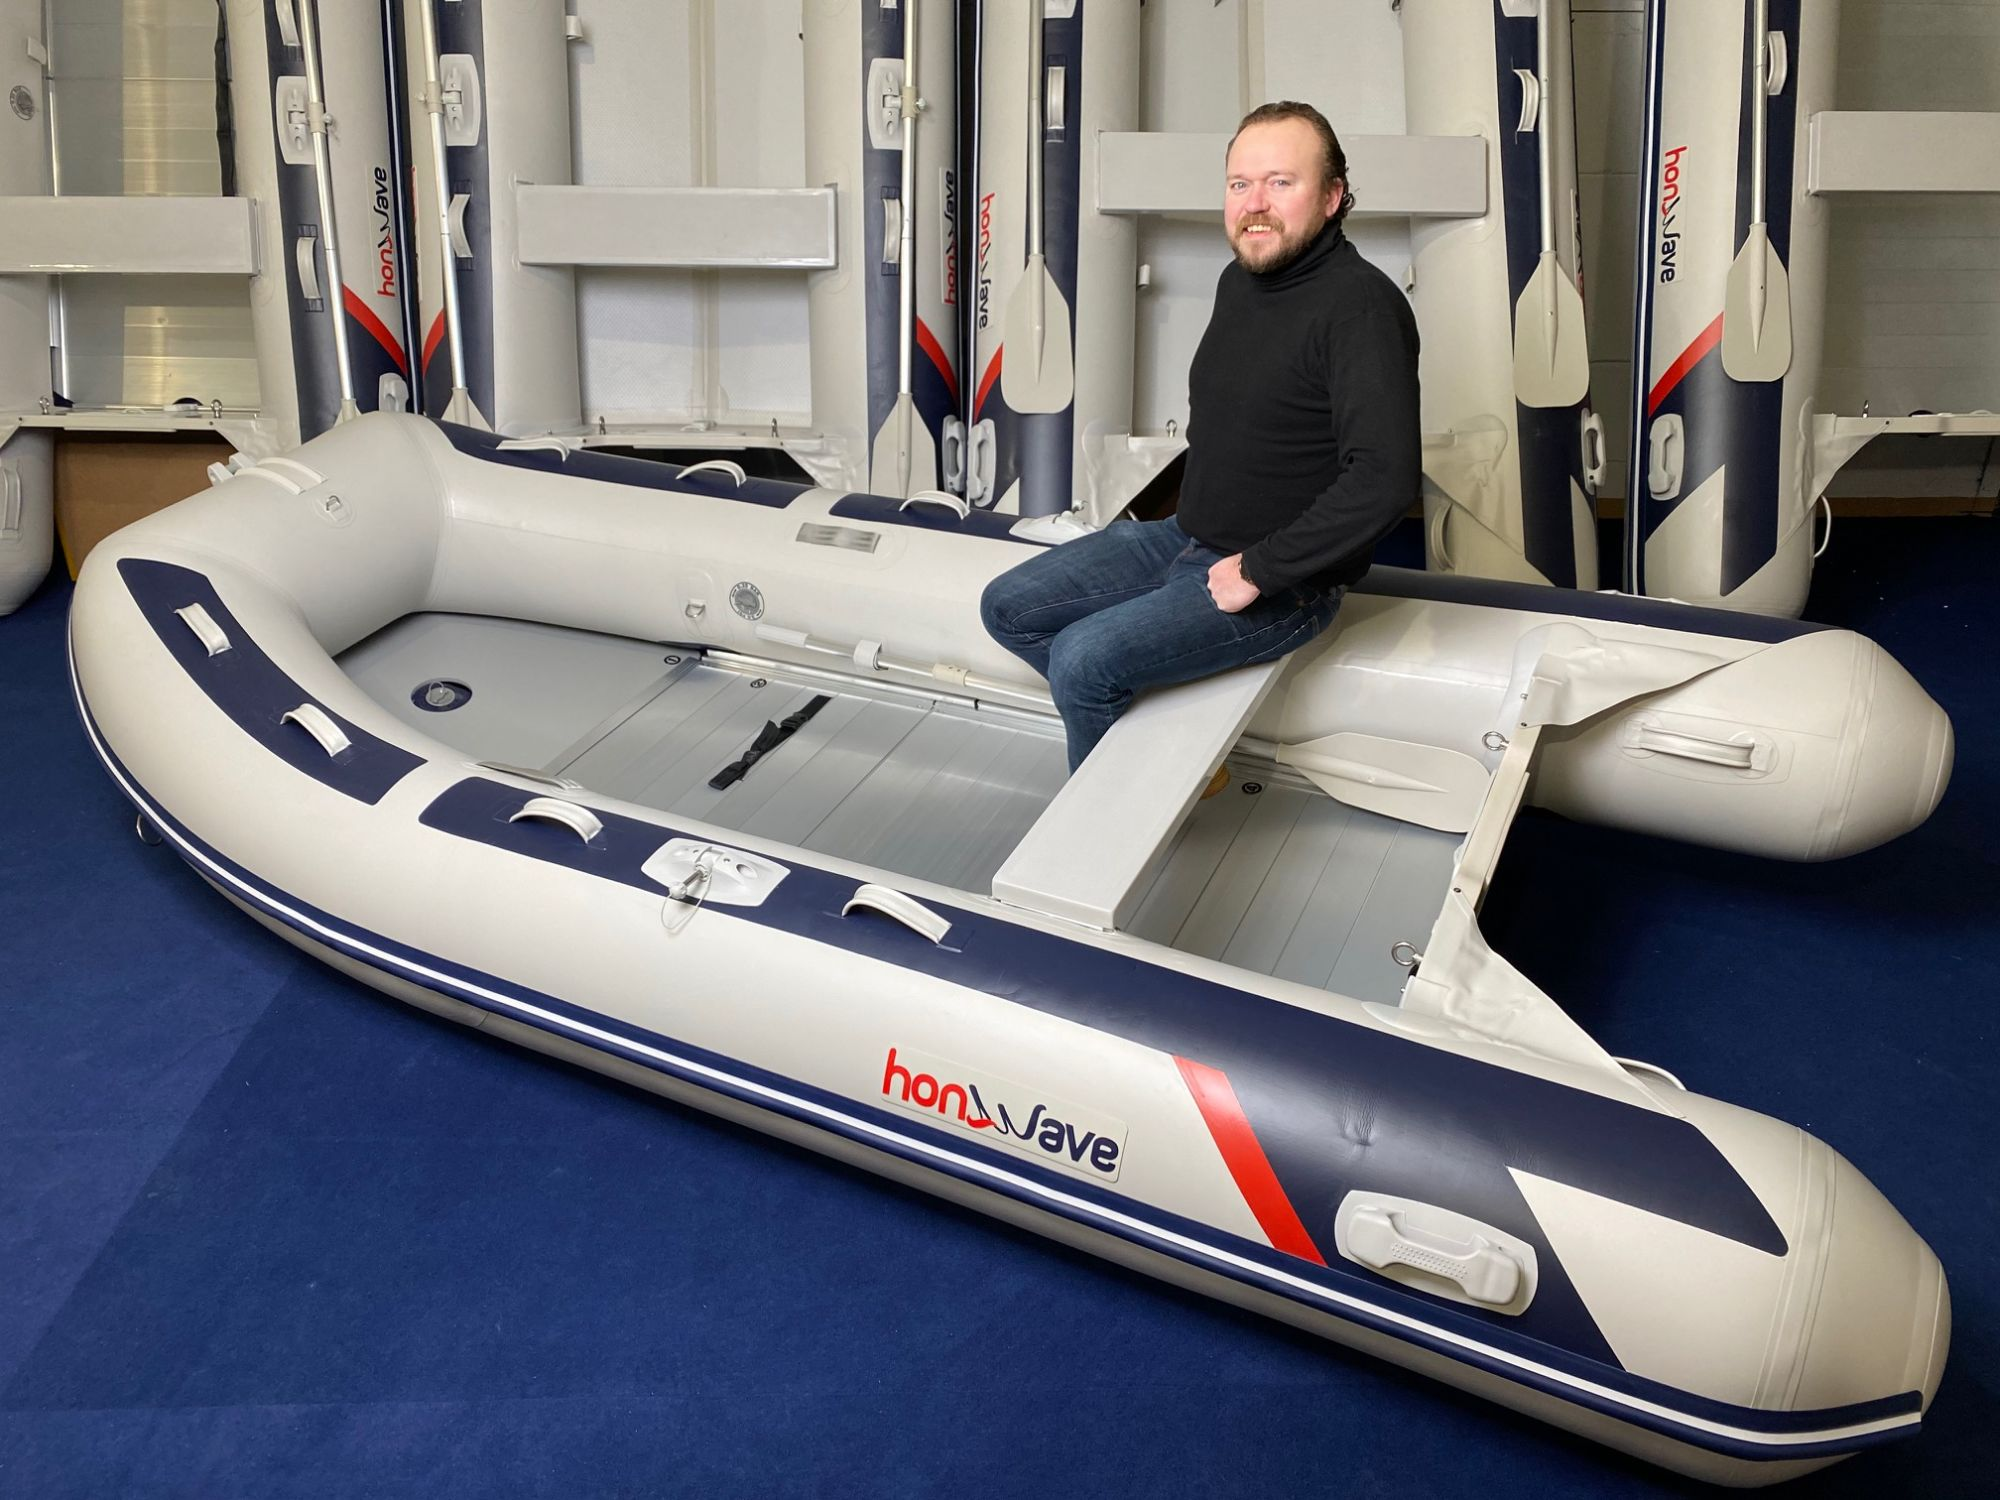 Honda Honwave T35 AE3 Schlauchboot Alu-Boden Mod.2021